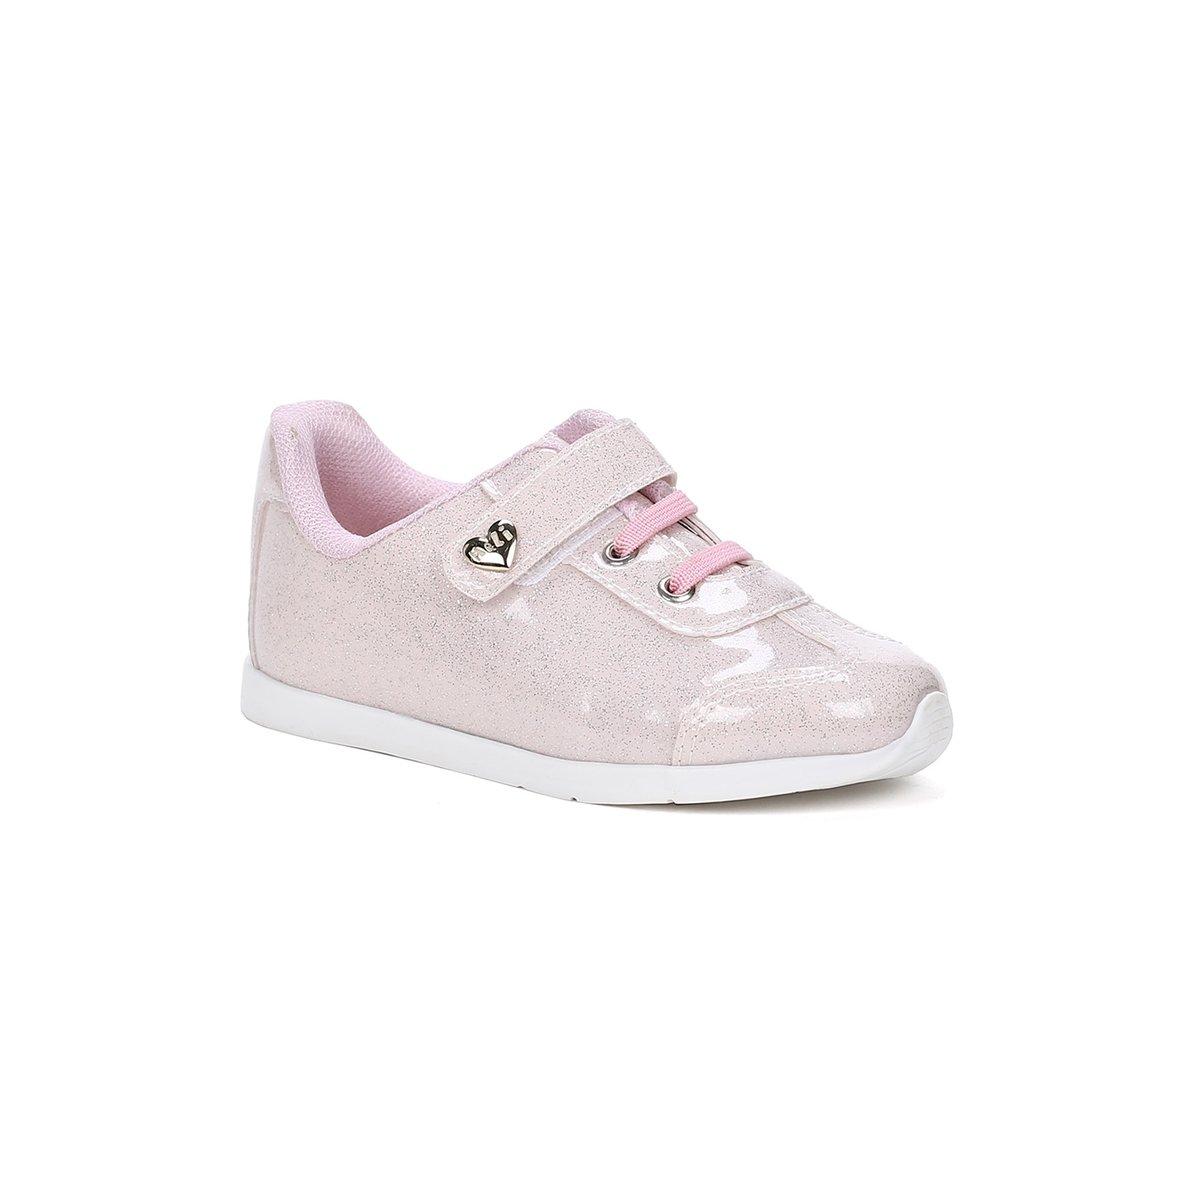 d40d0cdf6b2 Tênis Infantil Para Bebê Menina - Rosa - Compre Agora